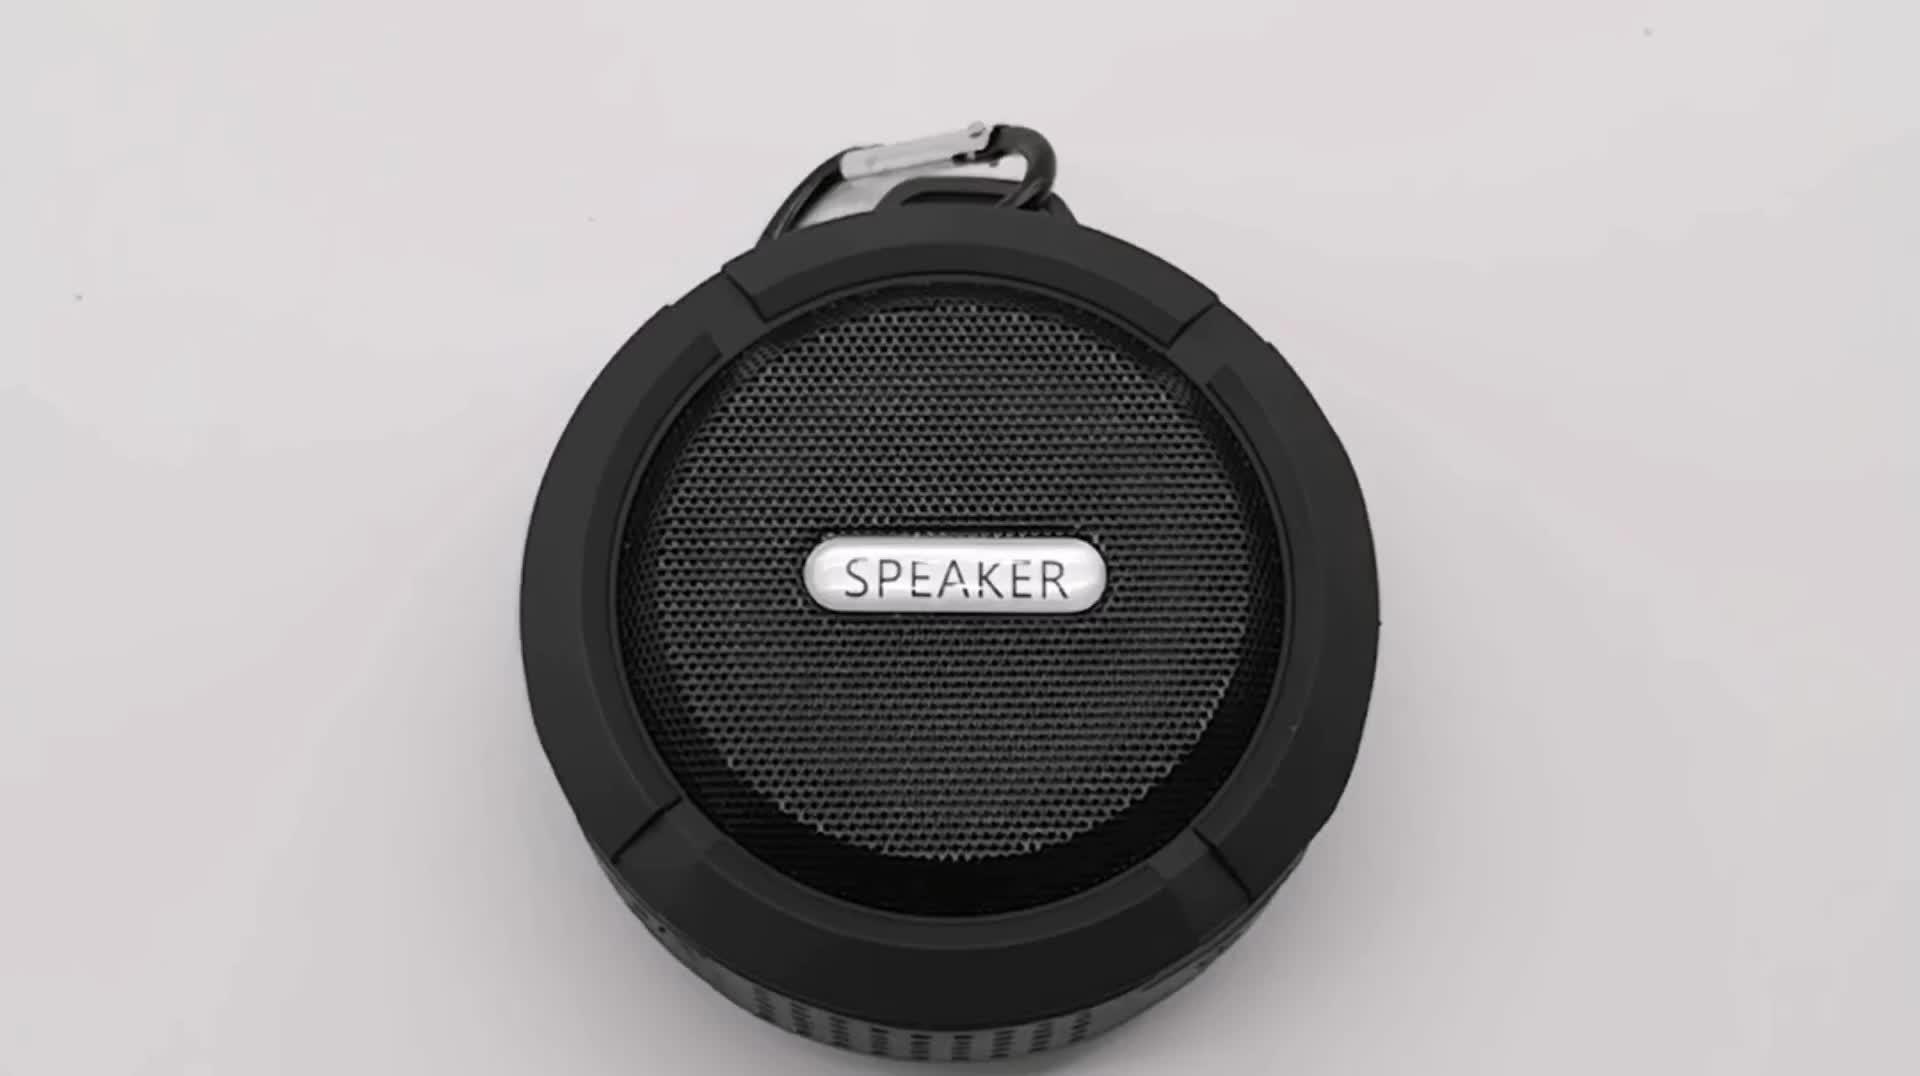 HOT koop Mini Waterdichte BT Speaker, Gadget Speaker BT, Water Proof BT Speaker